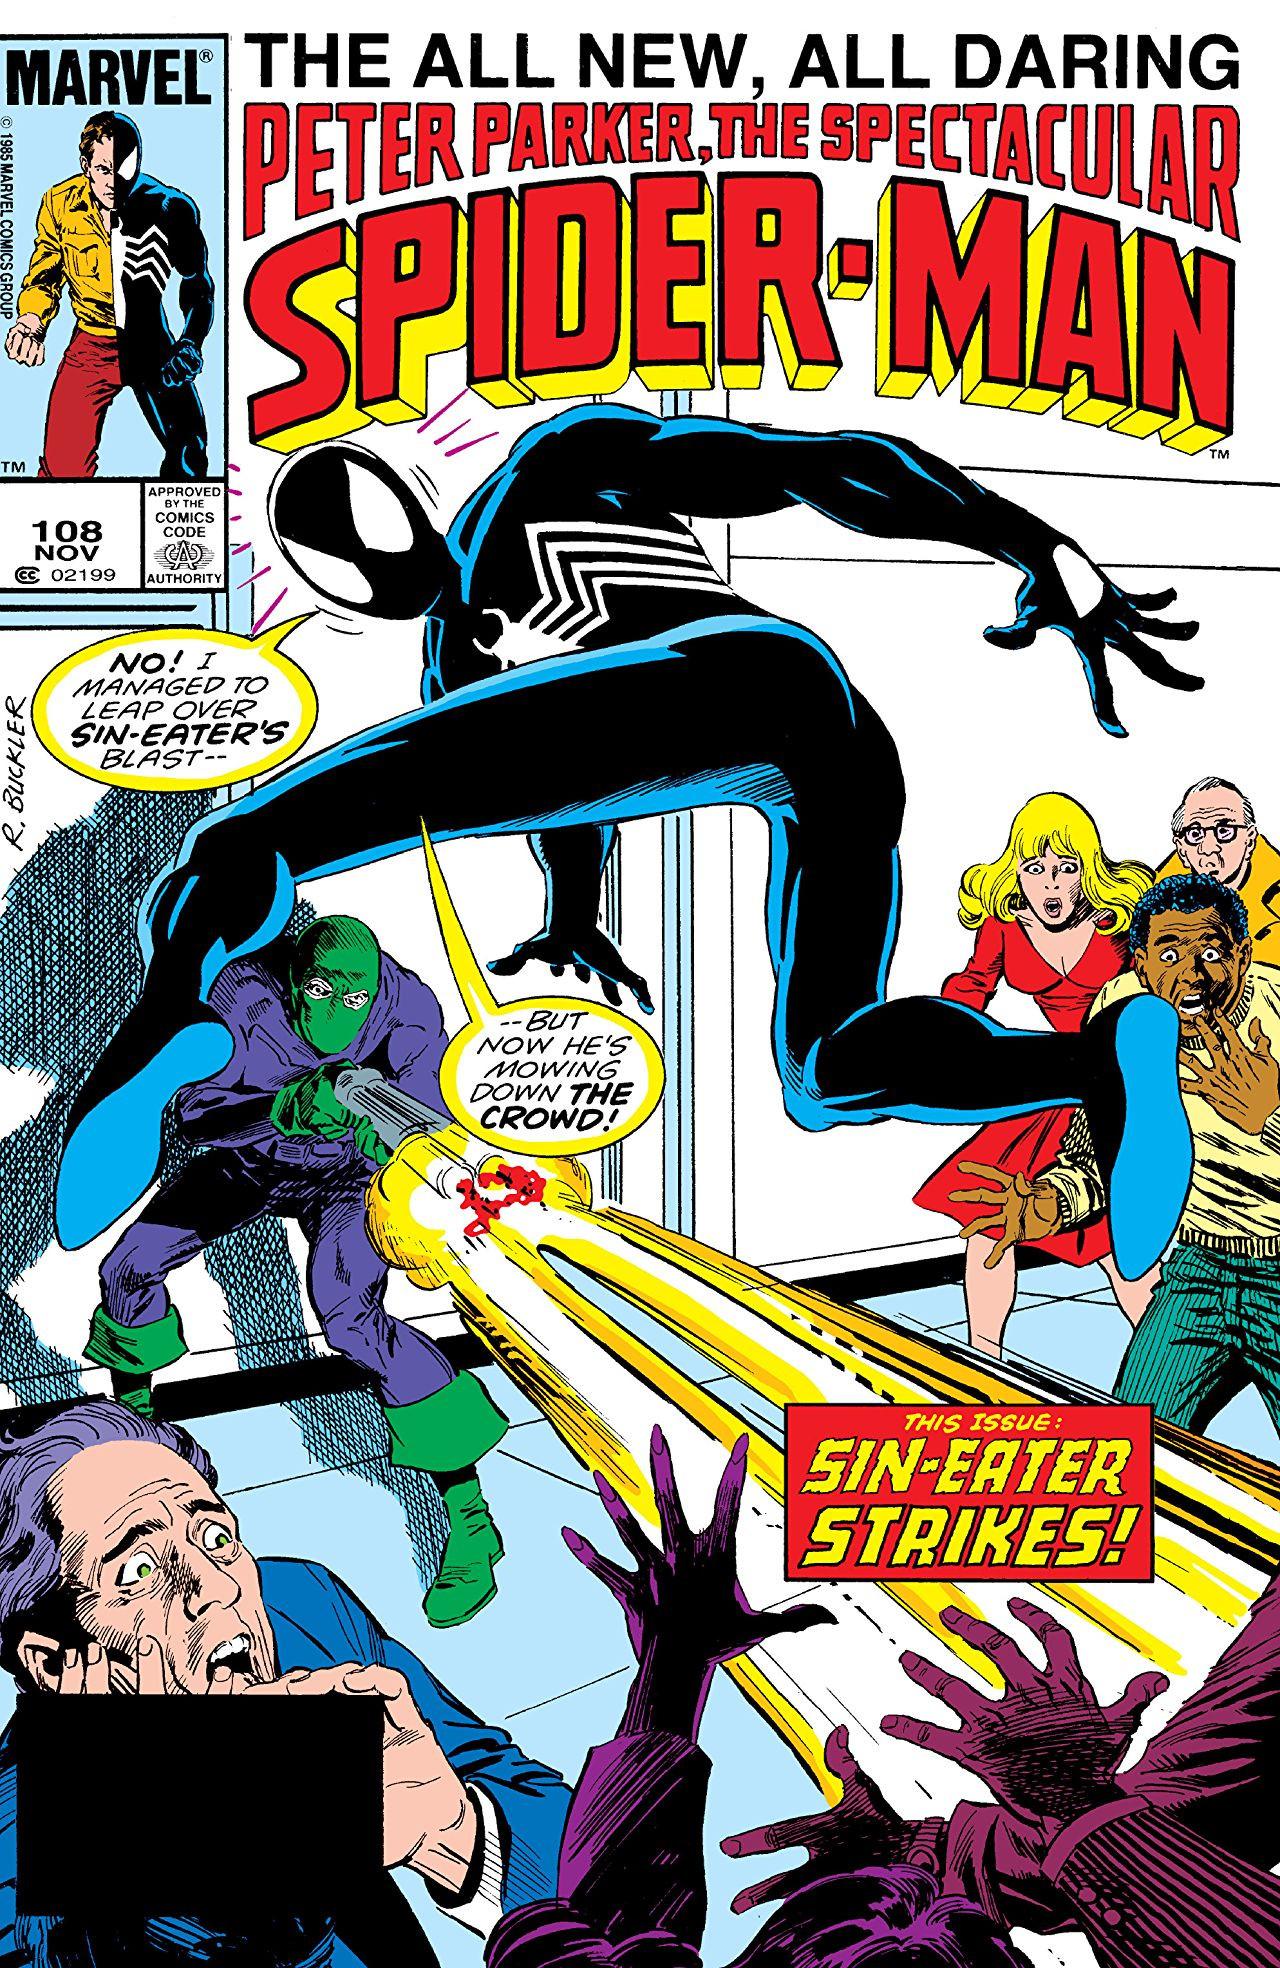 Peter Parker, The Spectacular Spider-Man Vol 1 108